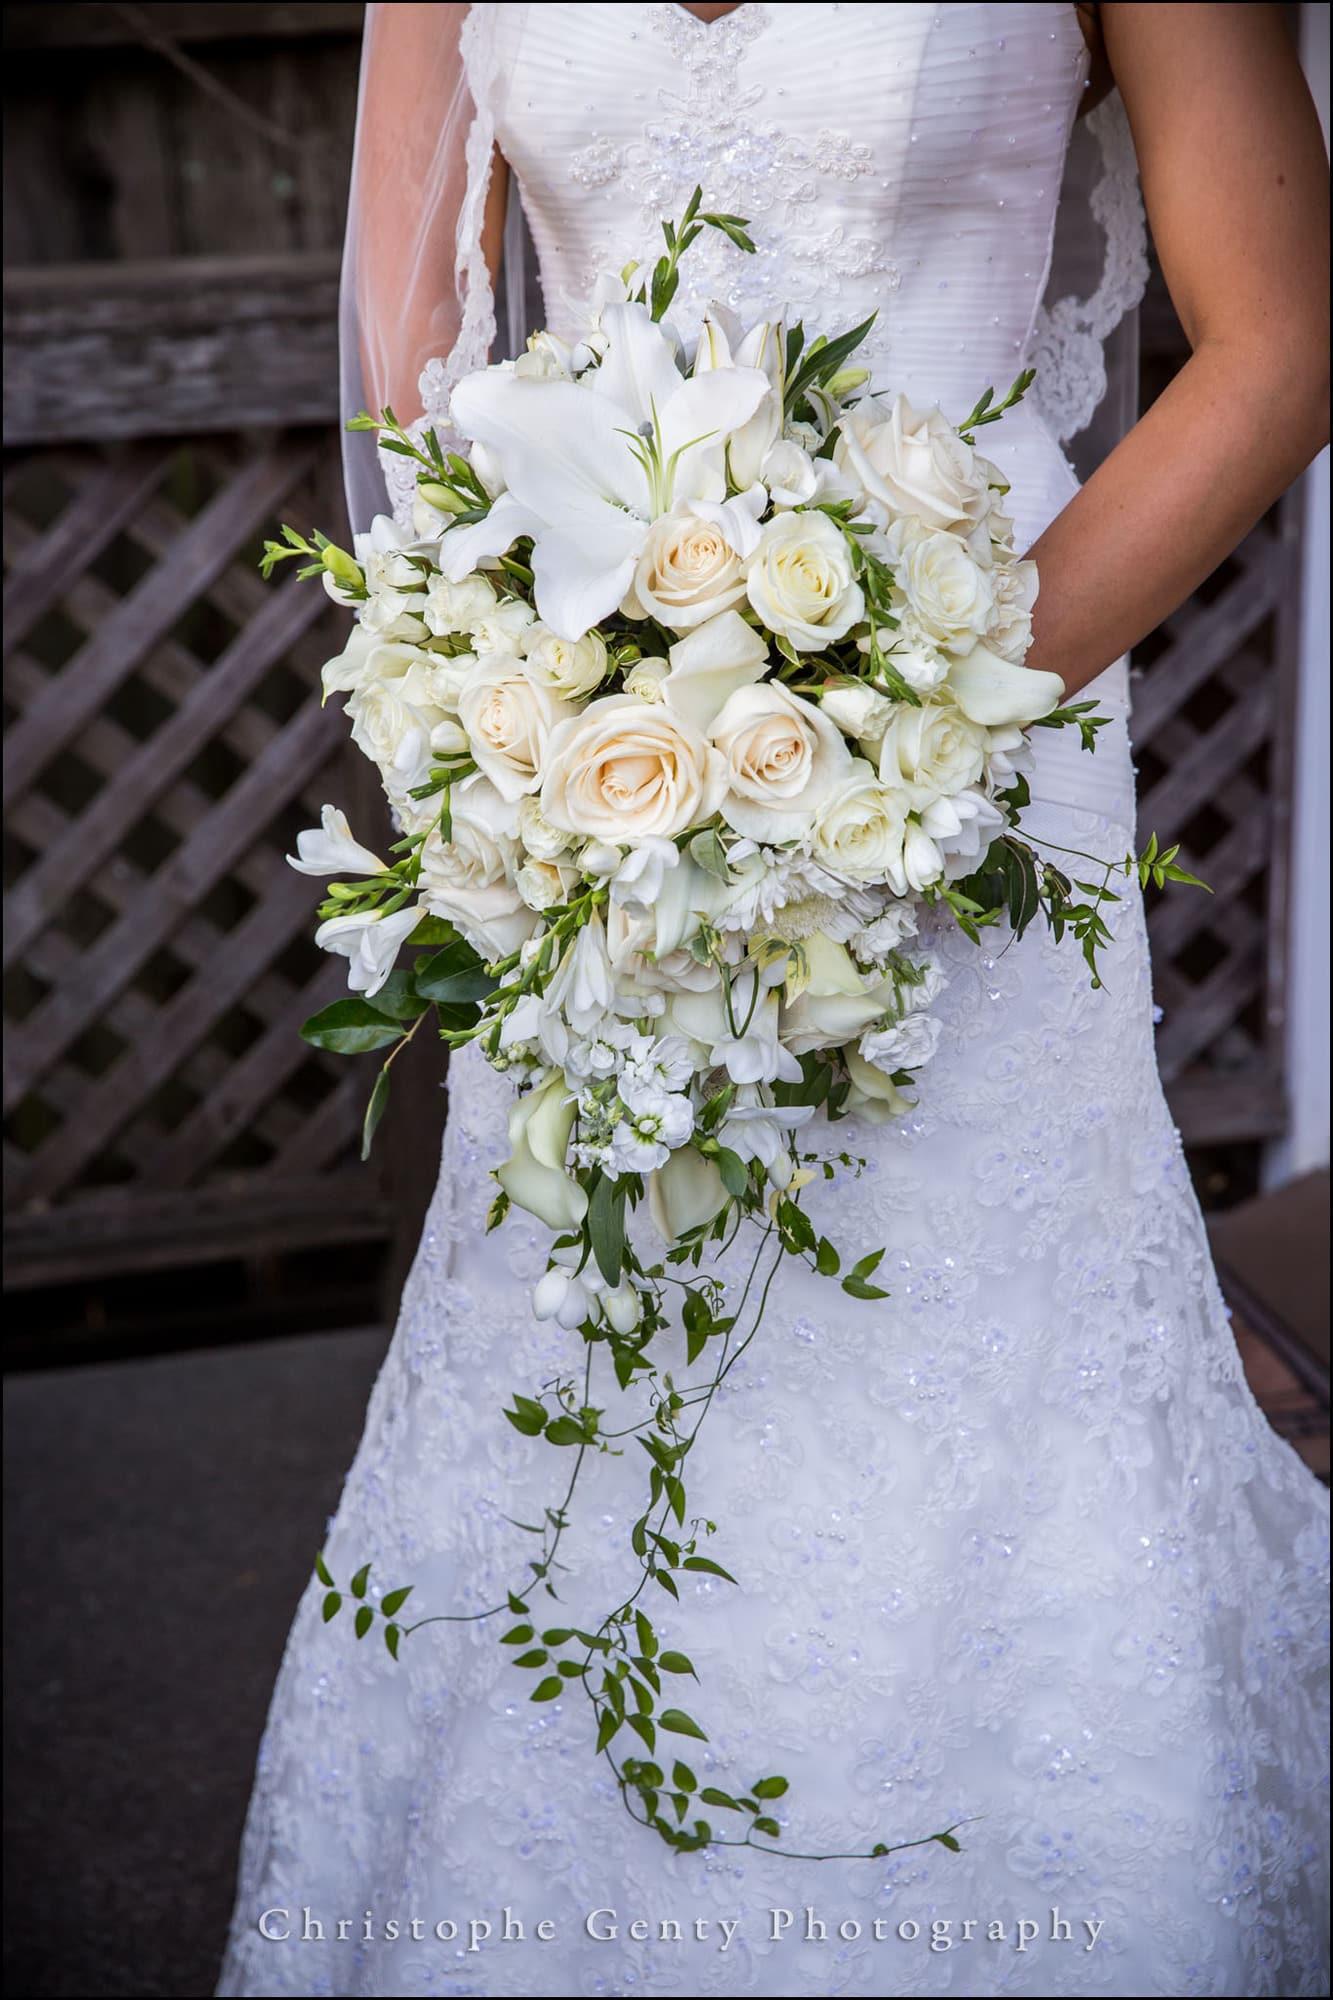 napa wedding photography at the Beazley House - Bethany & Charles